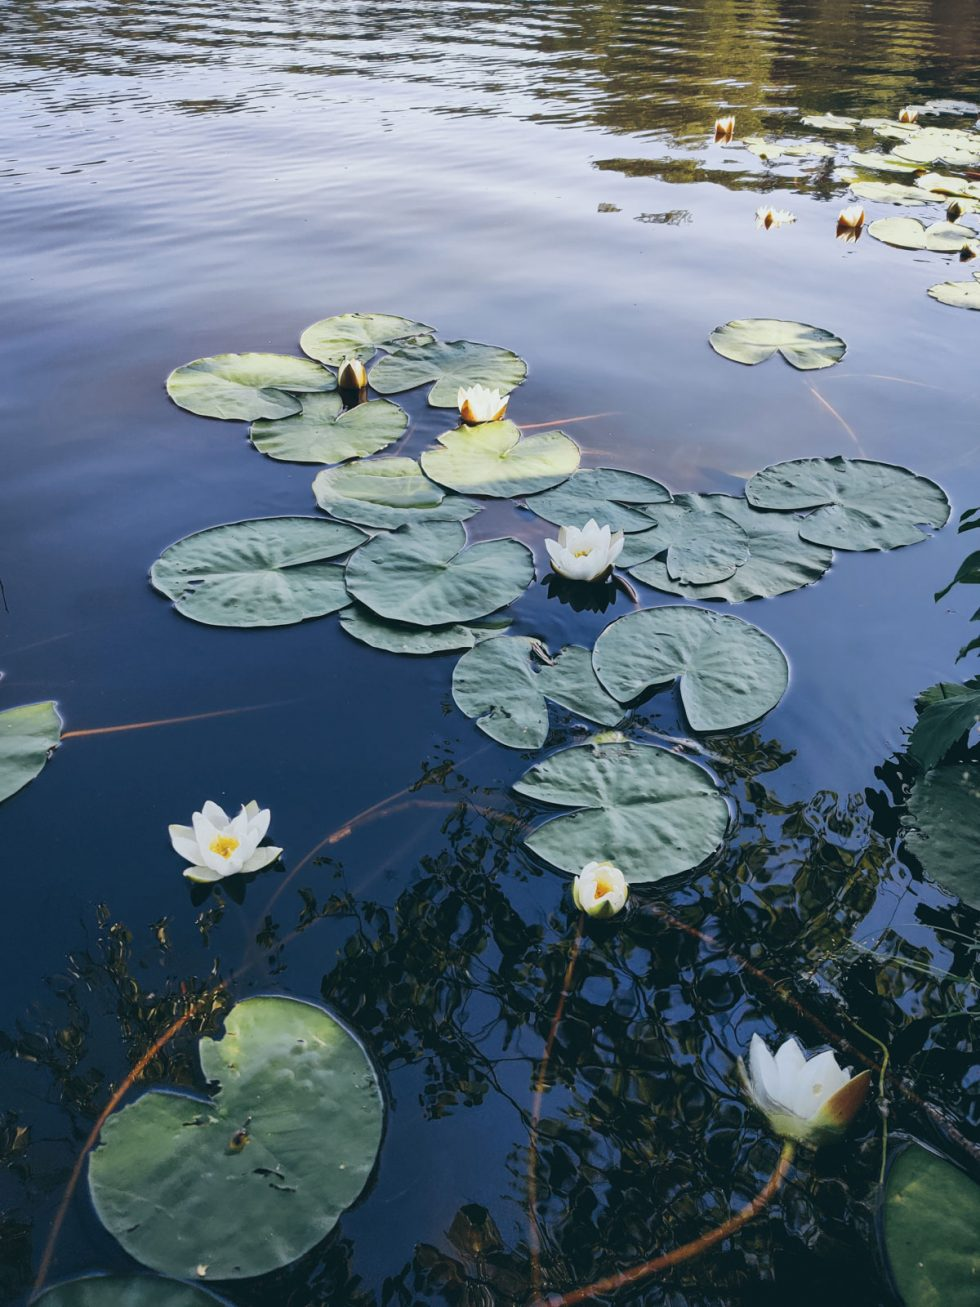 Water lilies in still water. Opens in lightbox.